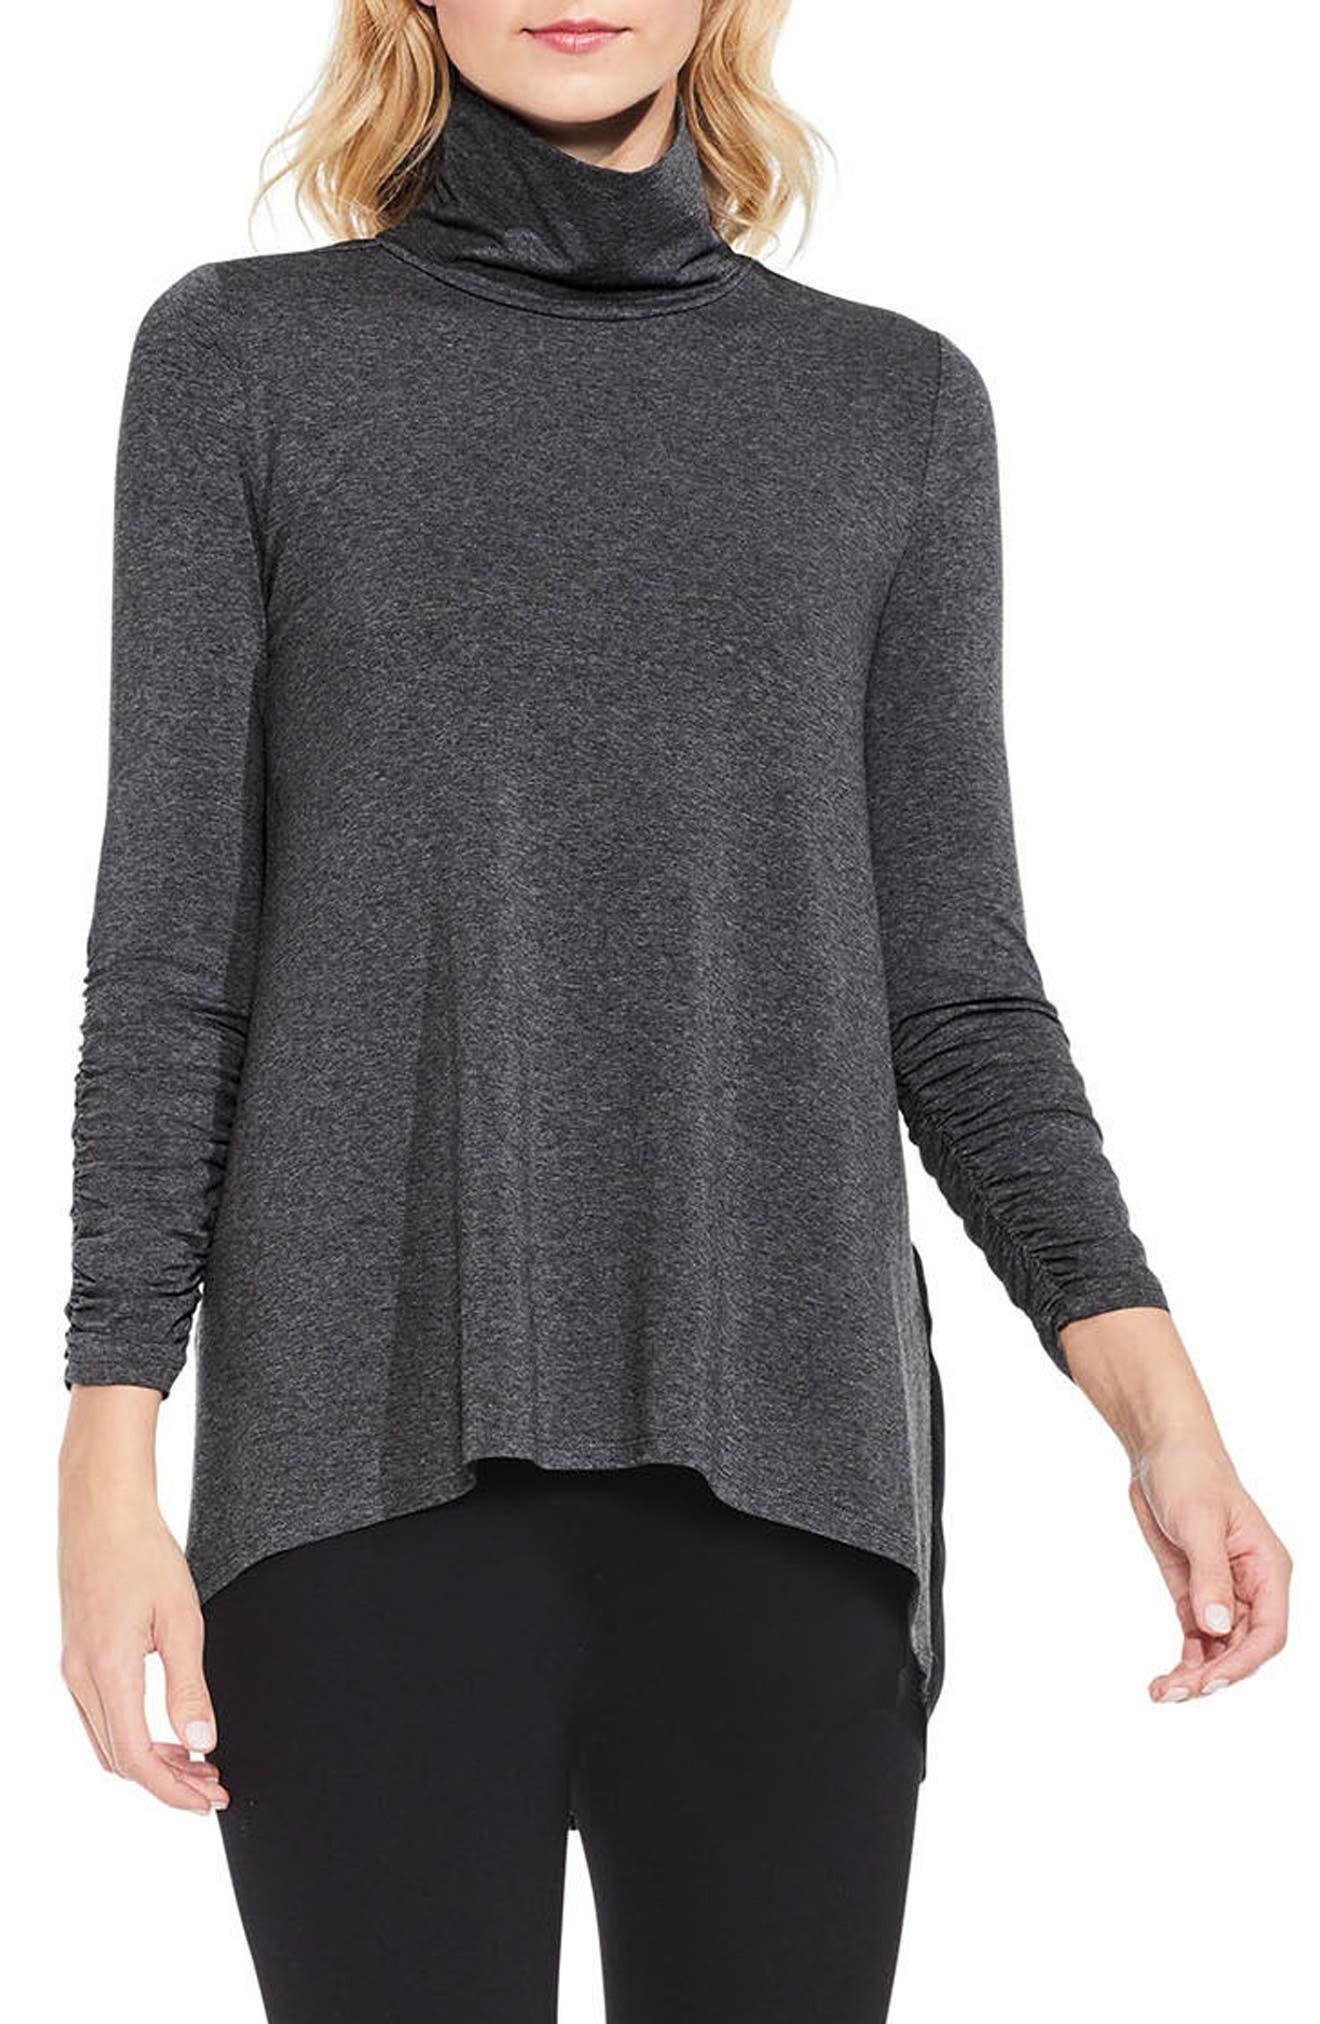 Ruched Sleeve Turtleneck,                         Main,                         color, Medium Heather Grey